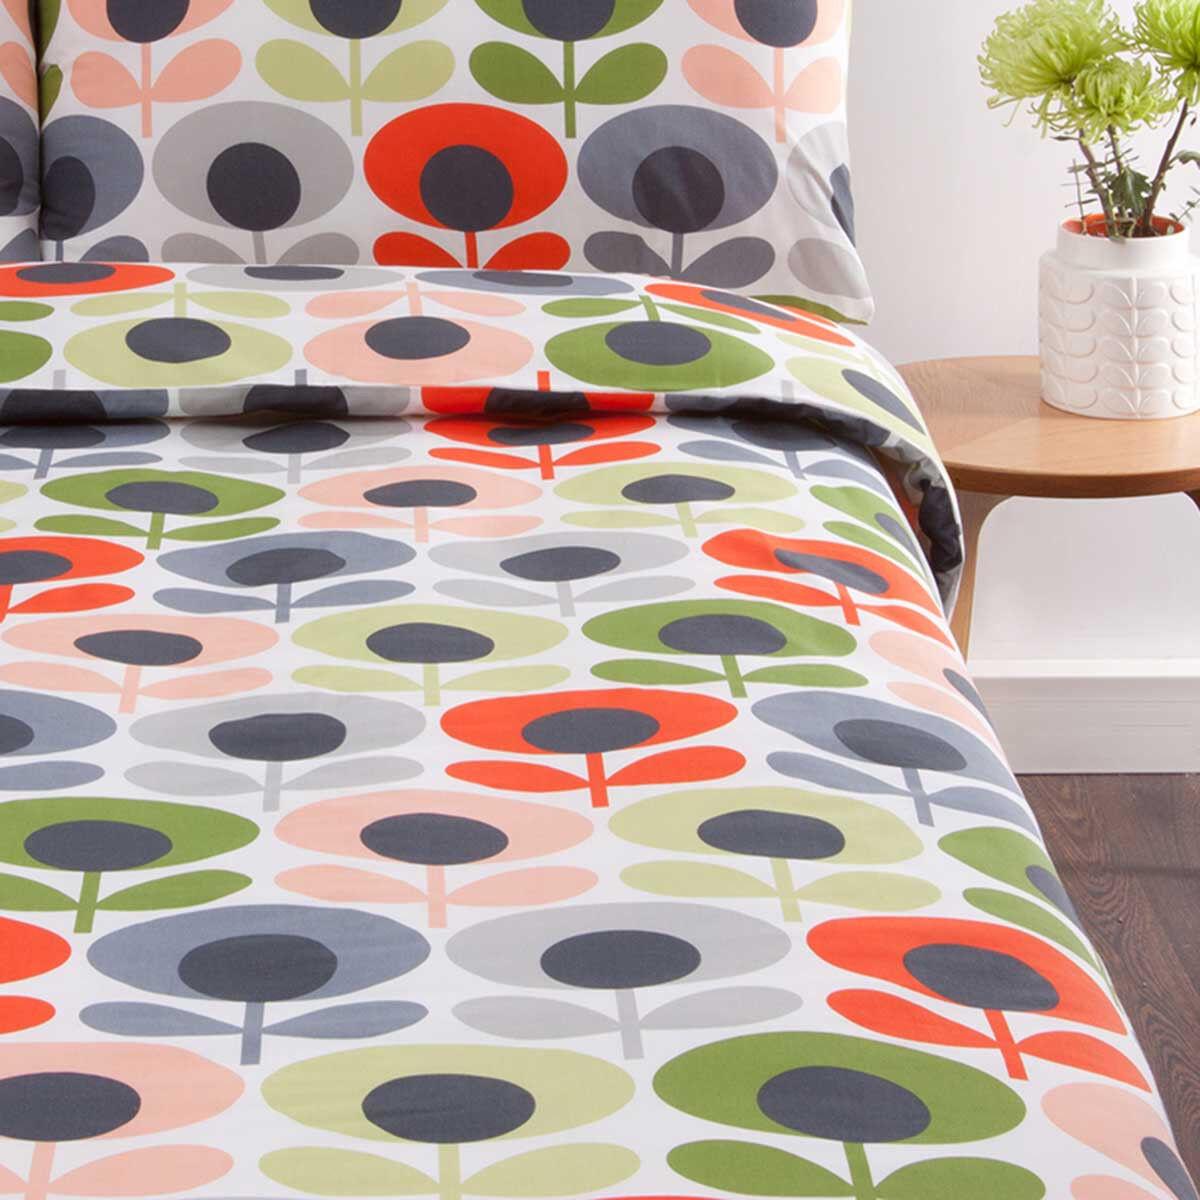 Orla Kiely Flower Oval High Quality Duvet Cover, King Size, Multi - New, Sealed